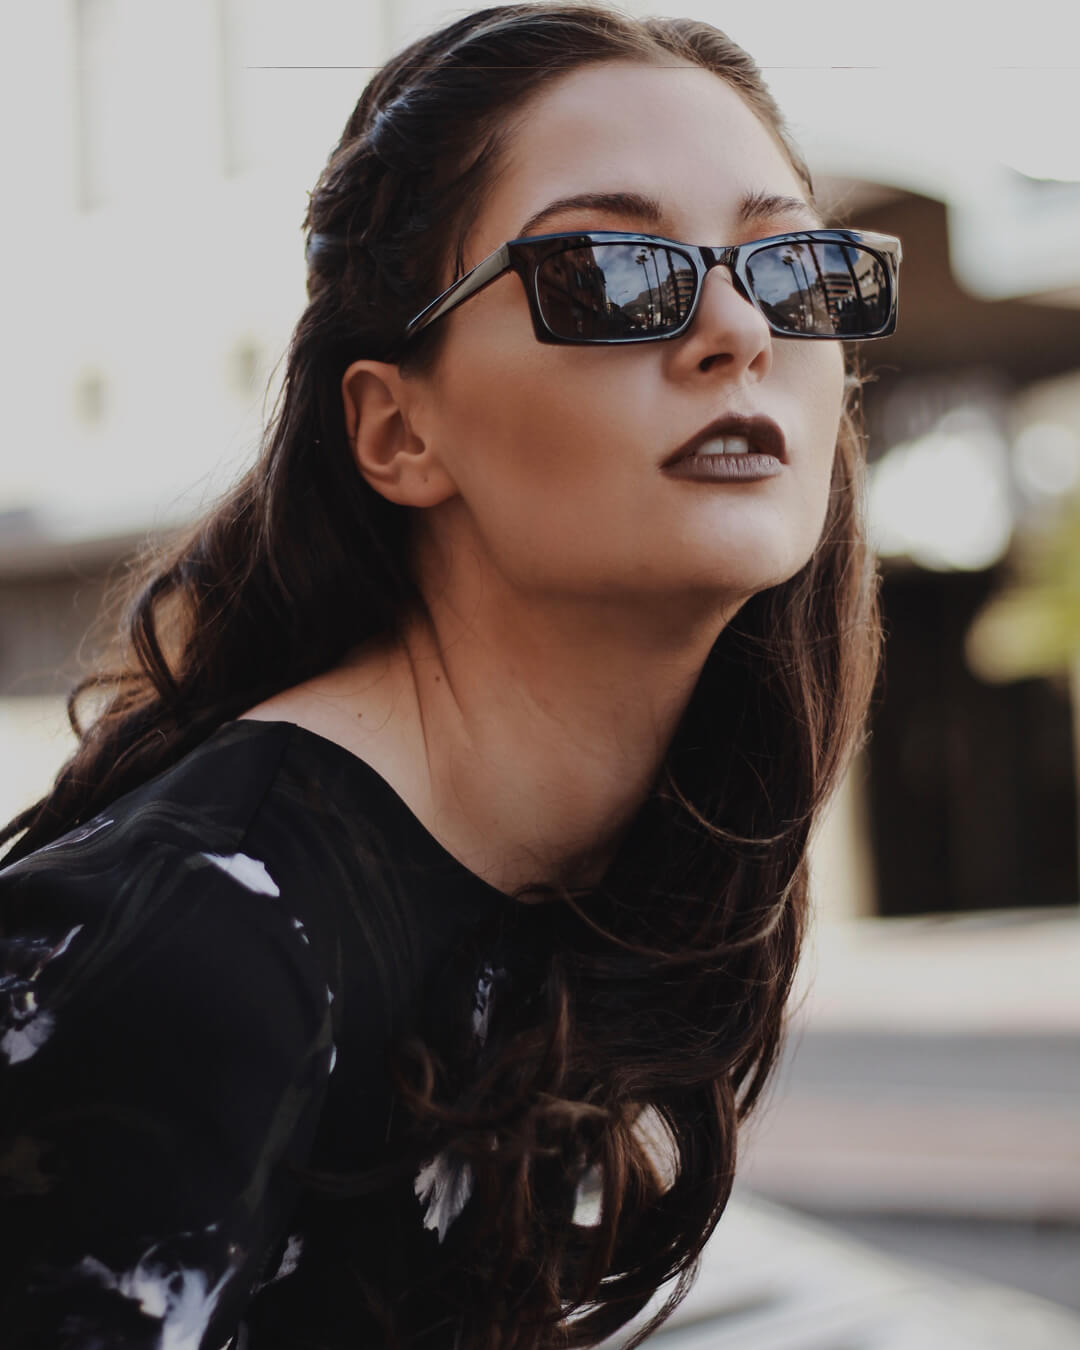 Azalea-Shades-Colour-Black